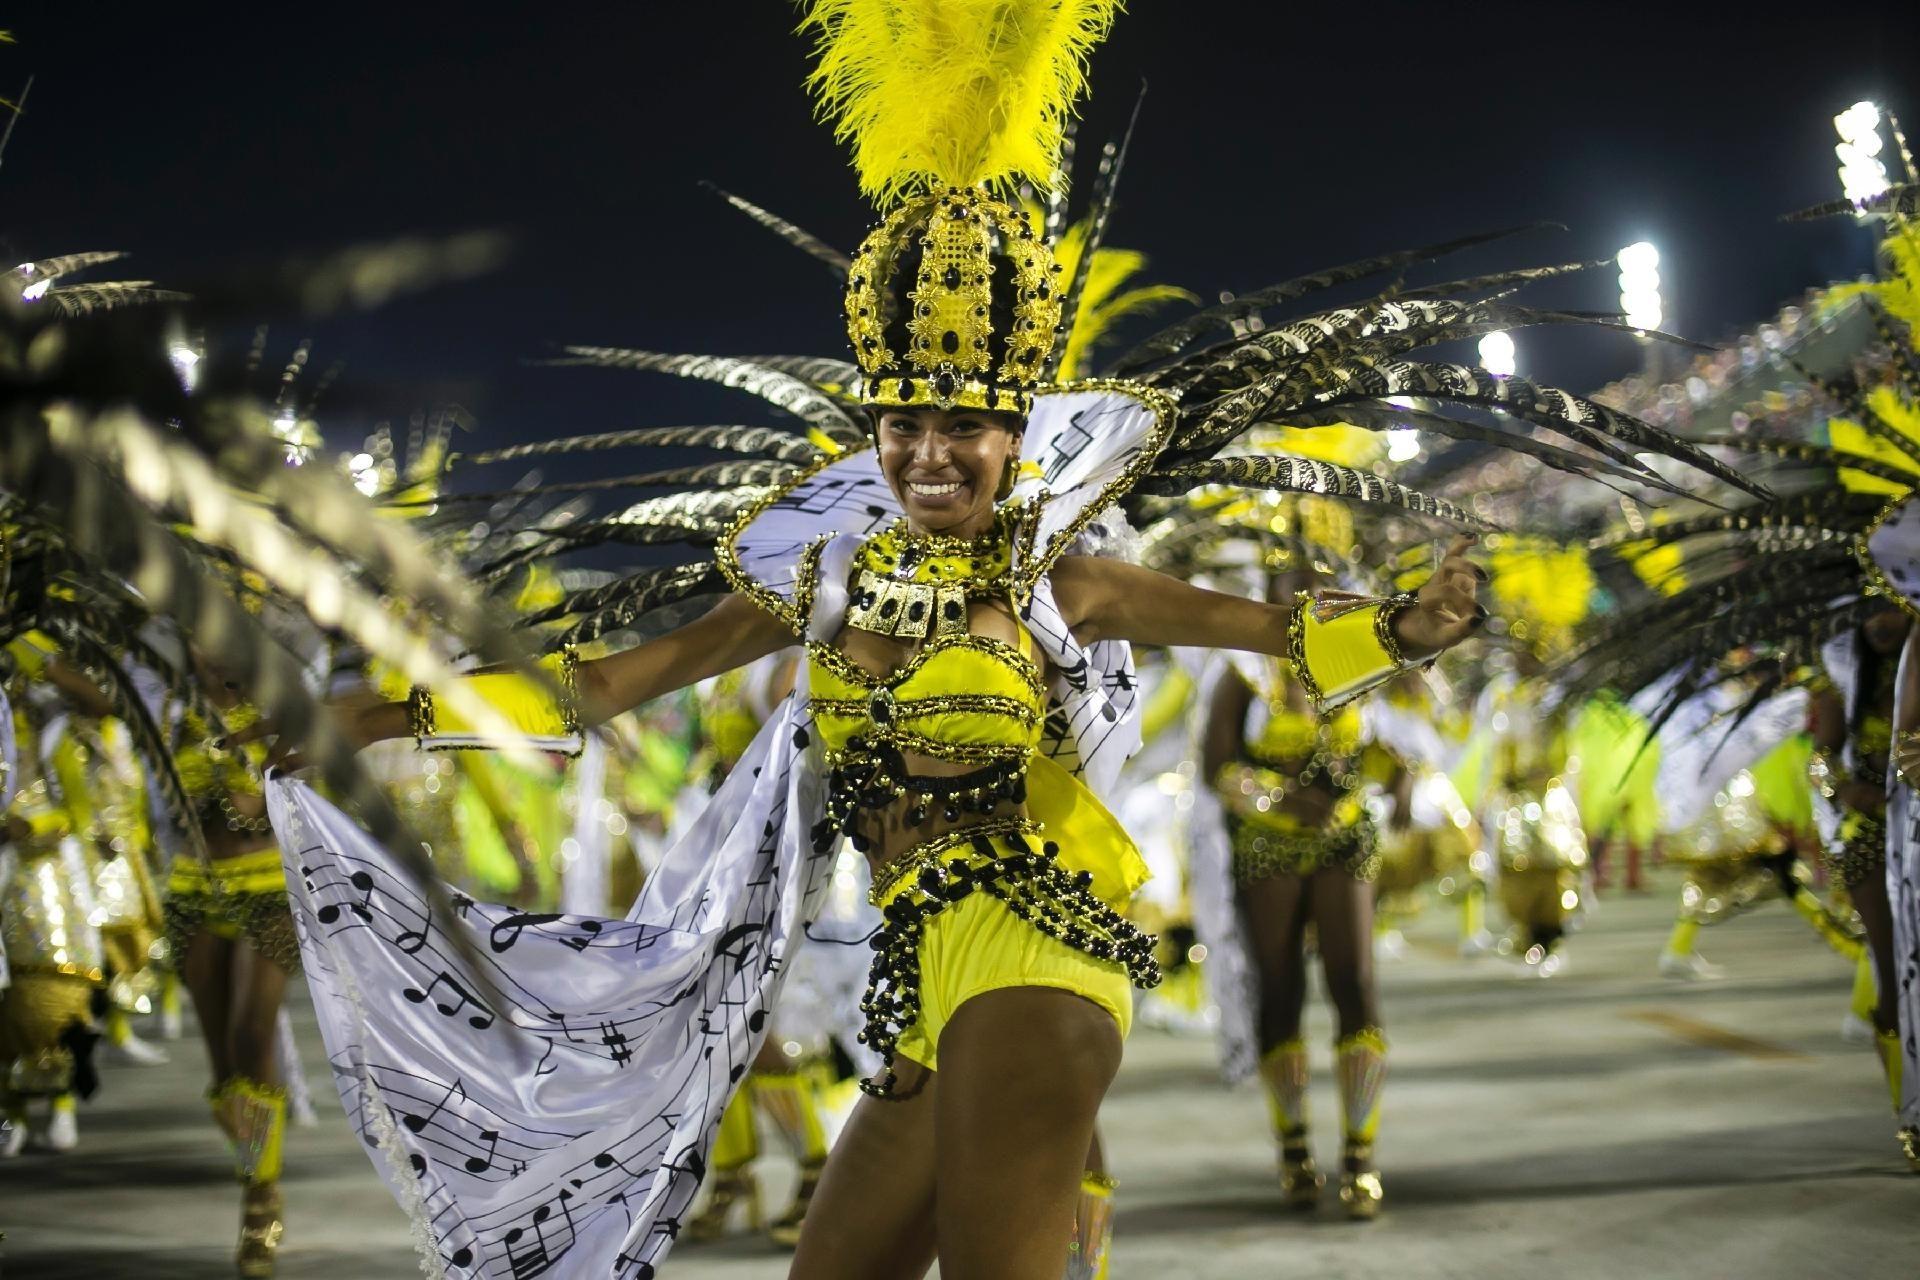 Fotos Carnaval 2017: São Clemente - CarnaUOL